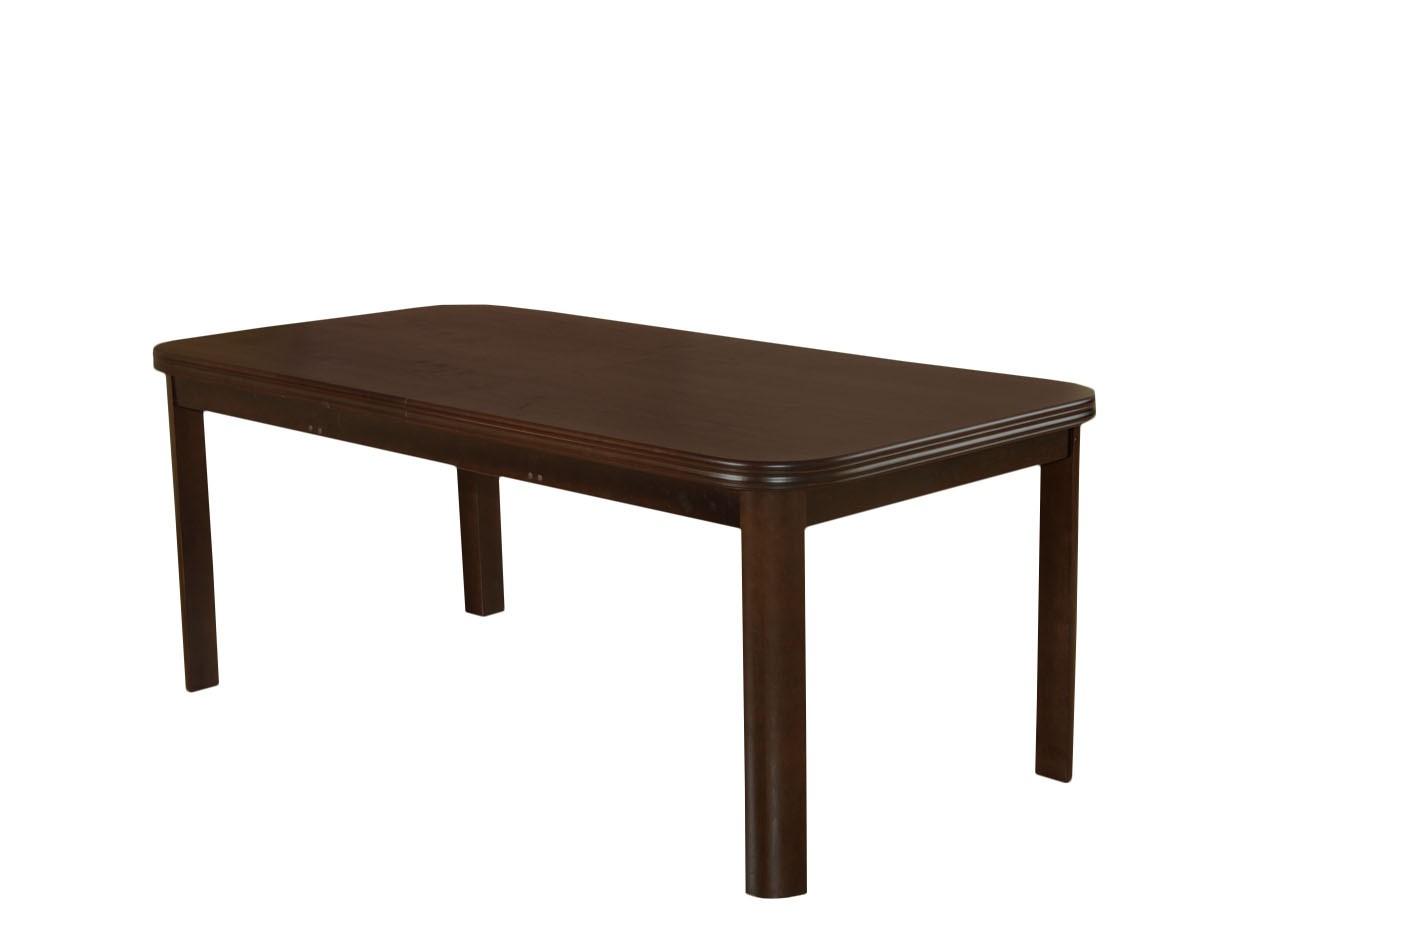 Stół Do Jadalni SM9 Na zaokrąglonych nogach Rozkładany Do 250 Cm